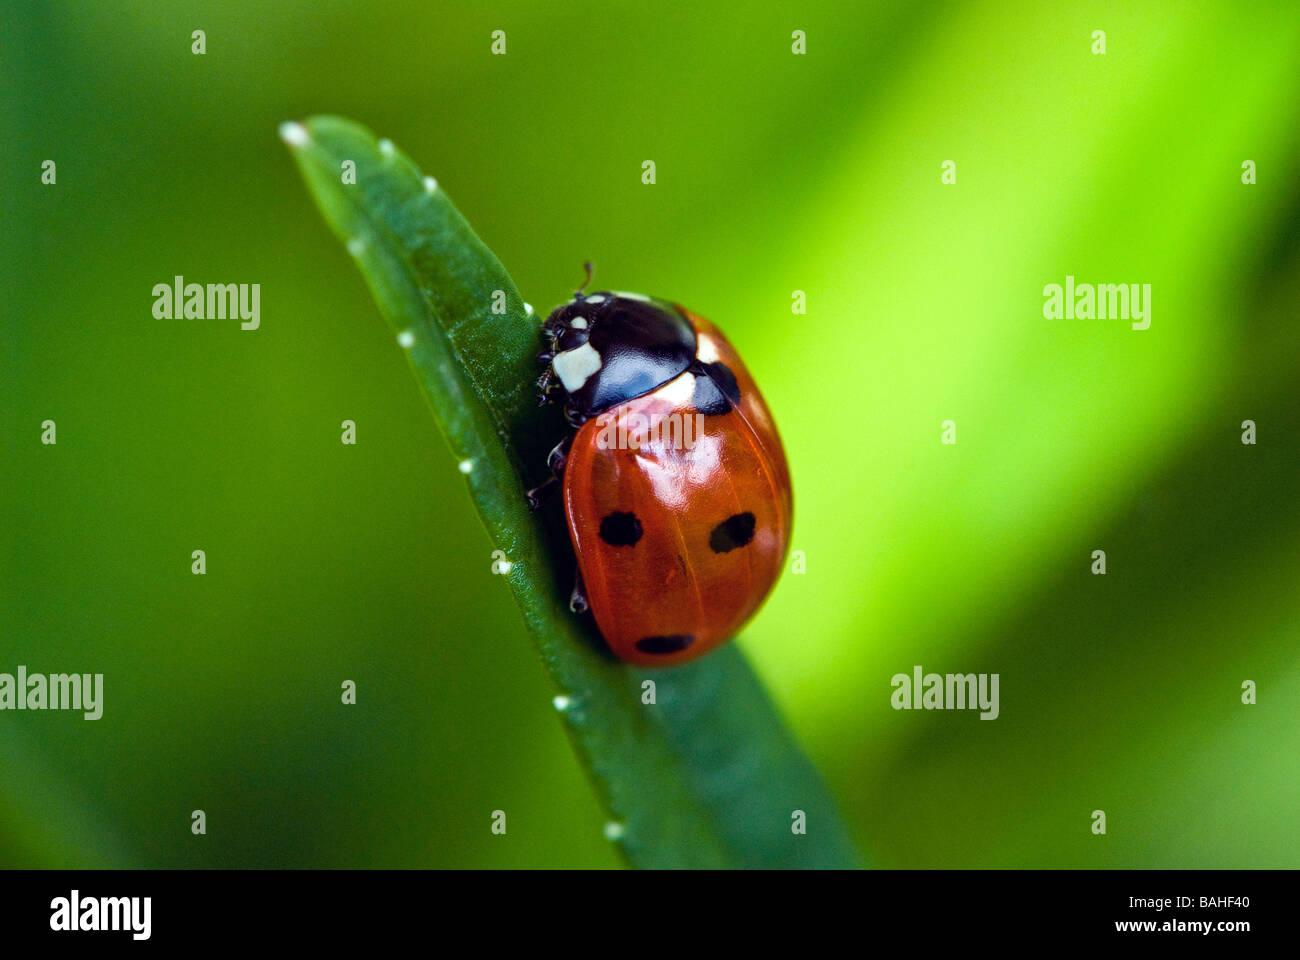 Marienkäfer auf einem Blatt Campanula hautnah. Detaillierten Makroaufnahme Stockbild